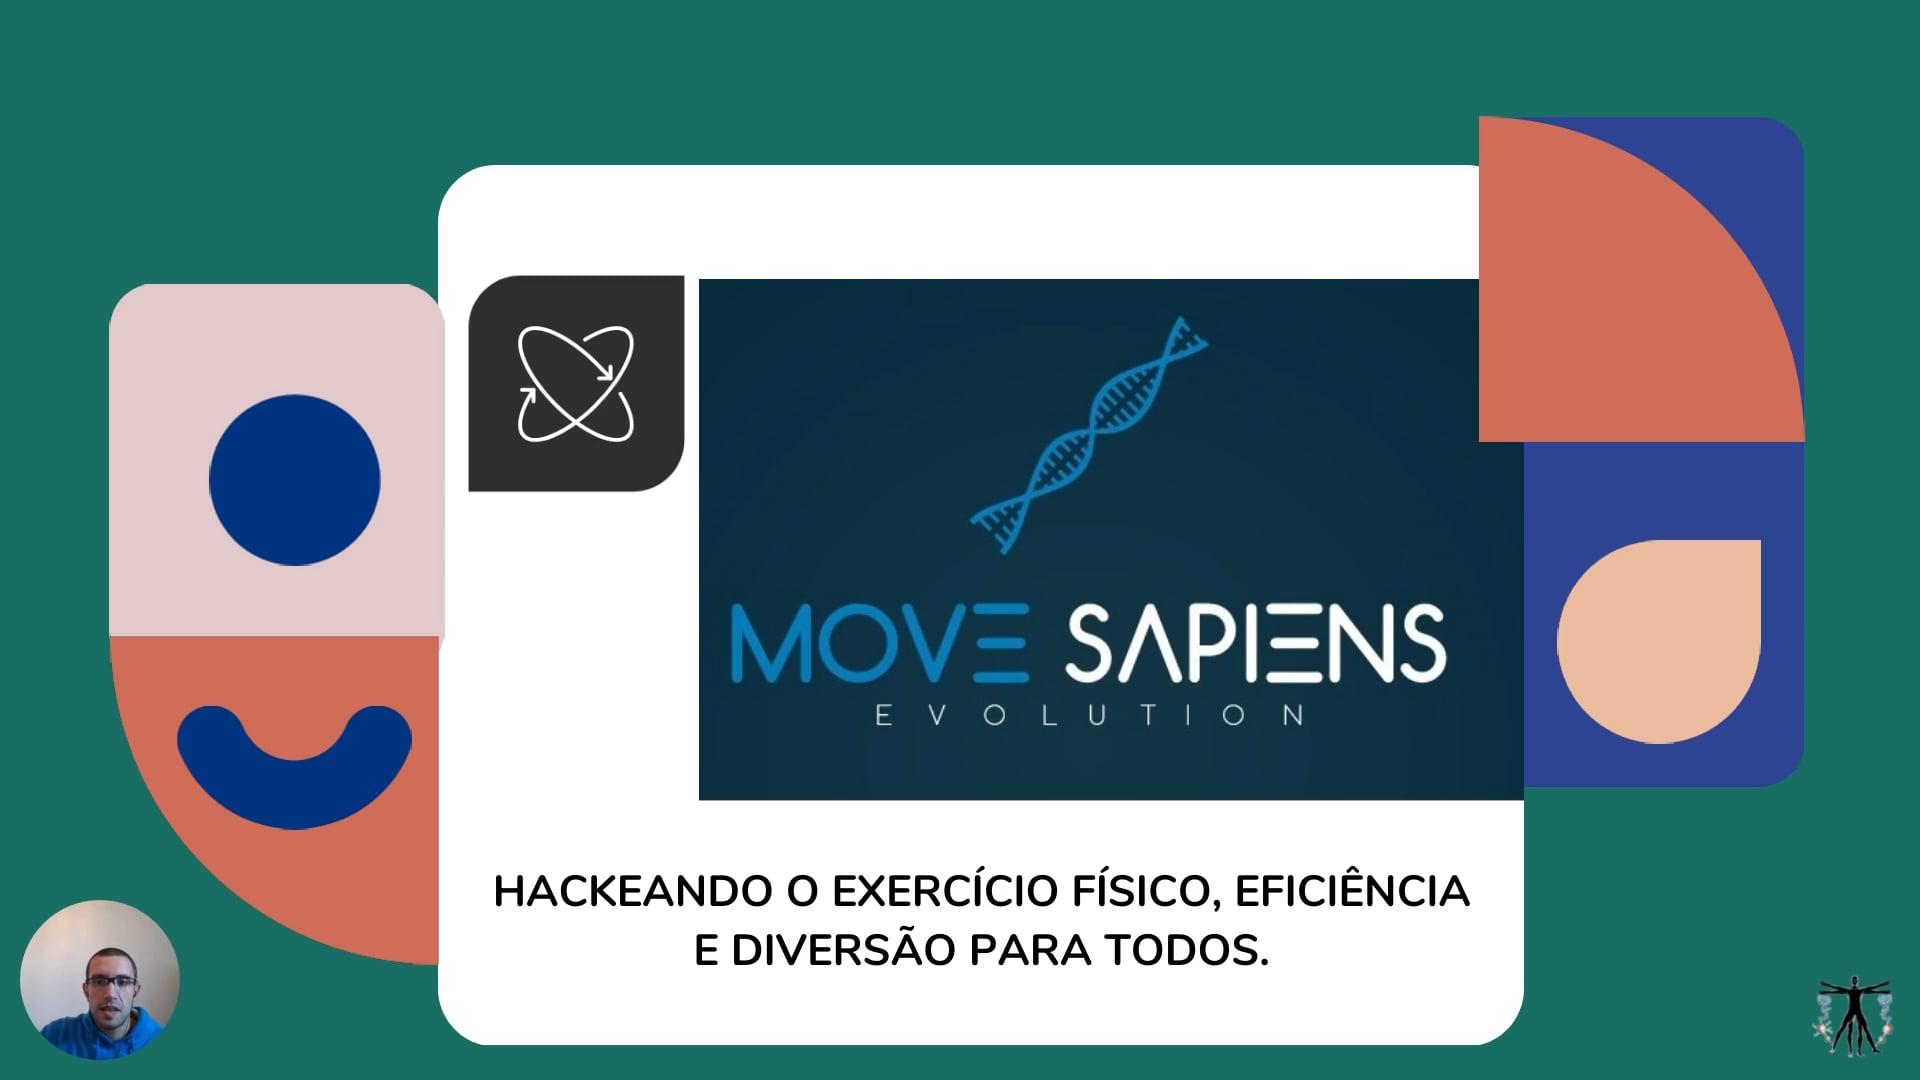 MoveSapiens